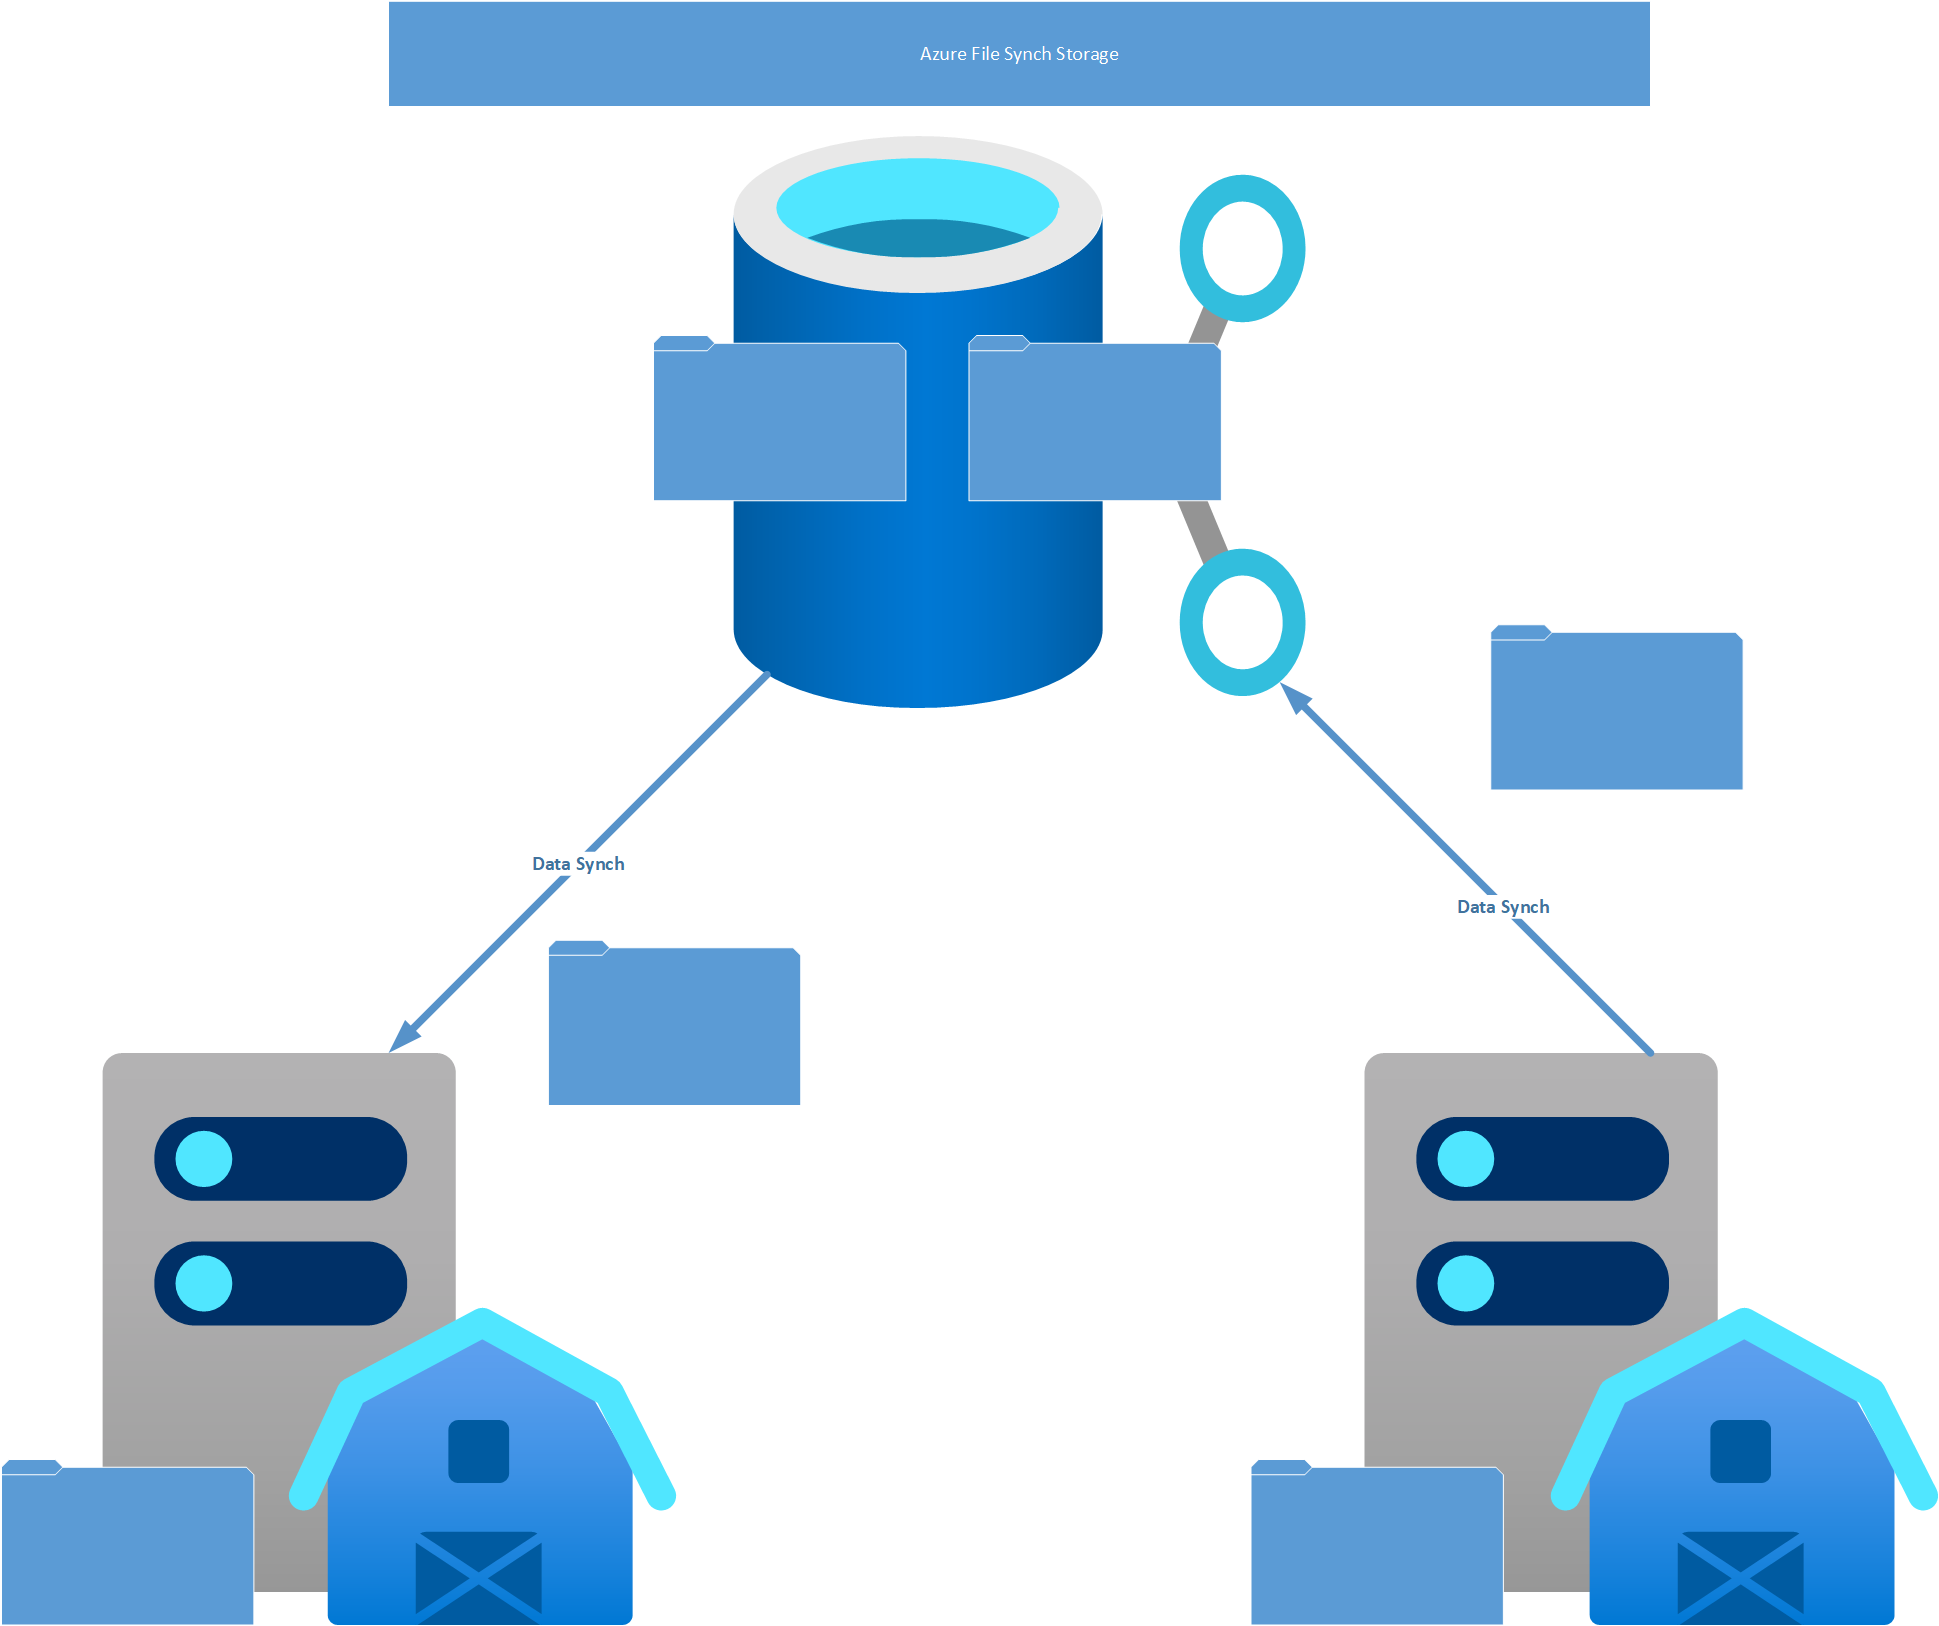 Azure FileSync Storage